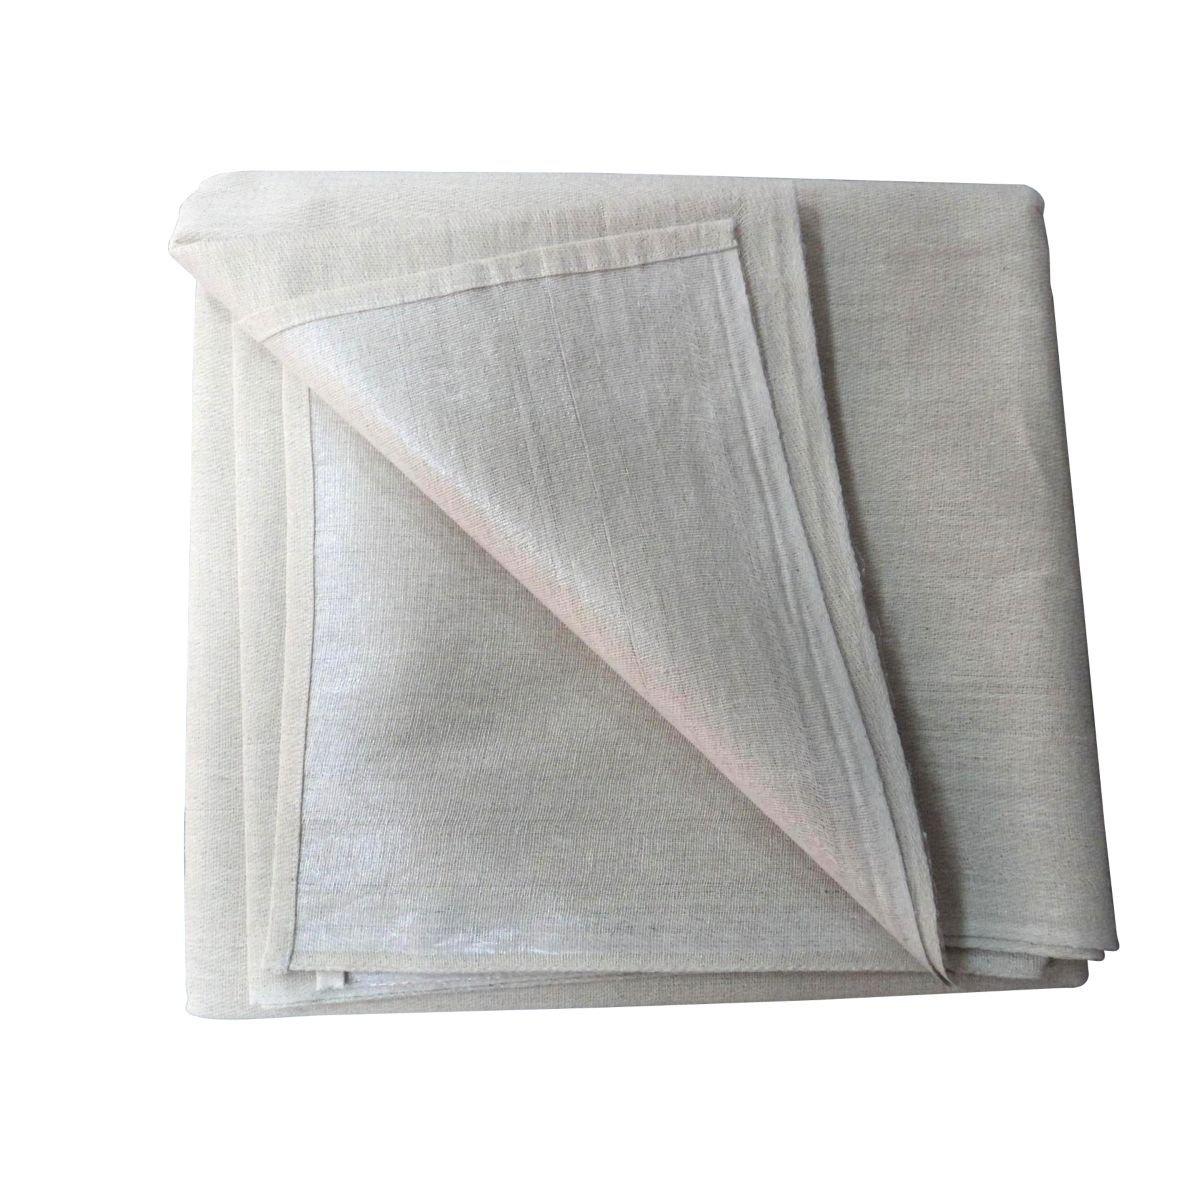 No Nonsense Poly-Backed Dust Sheet 12' x 9'